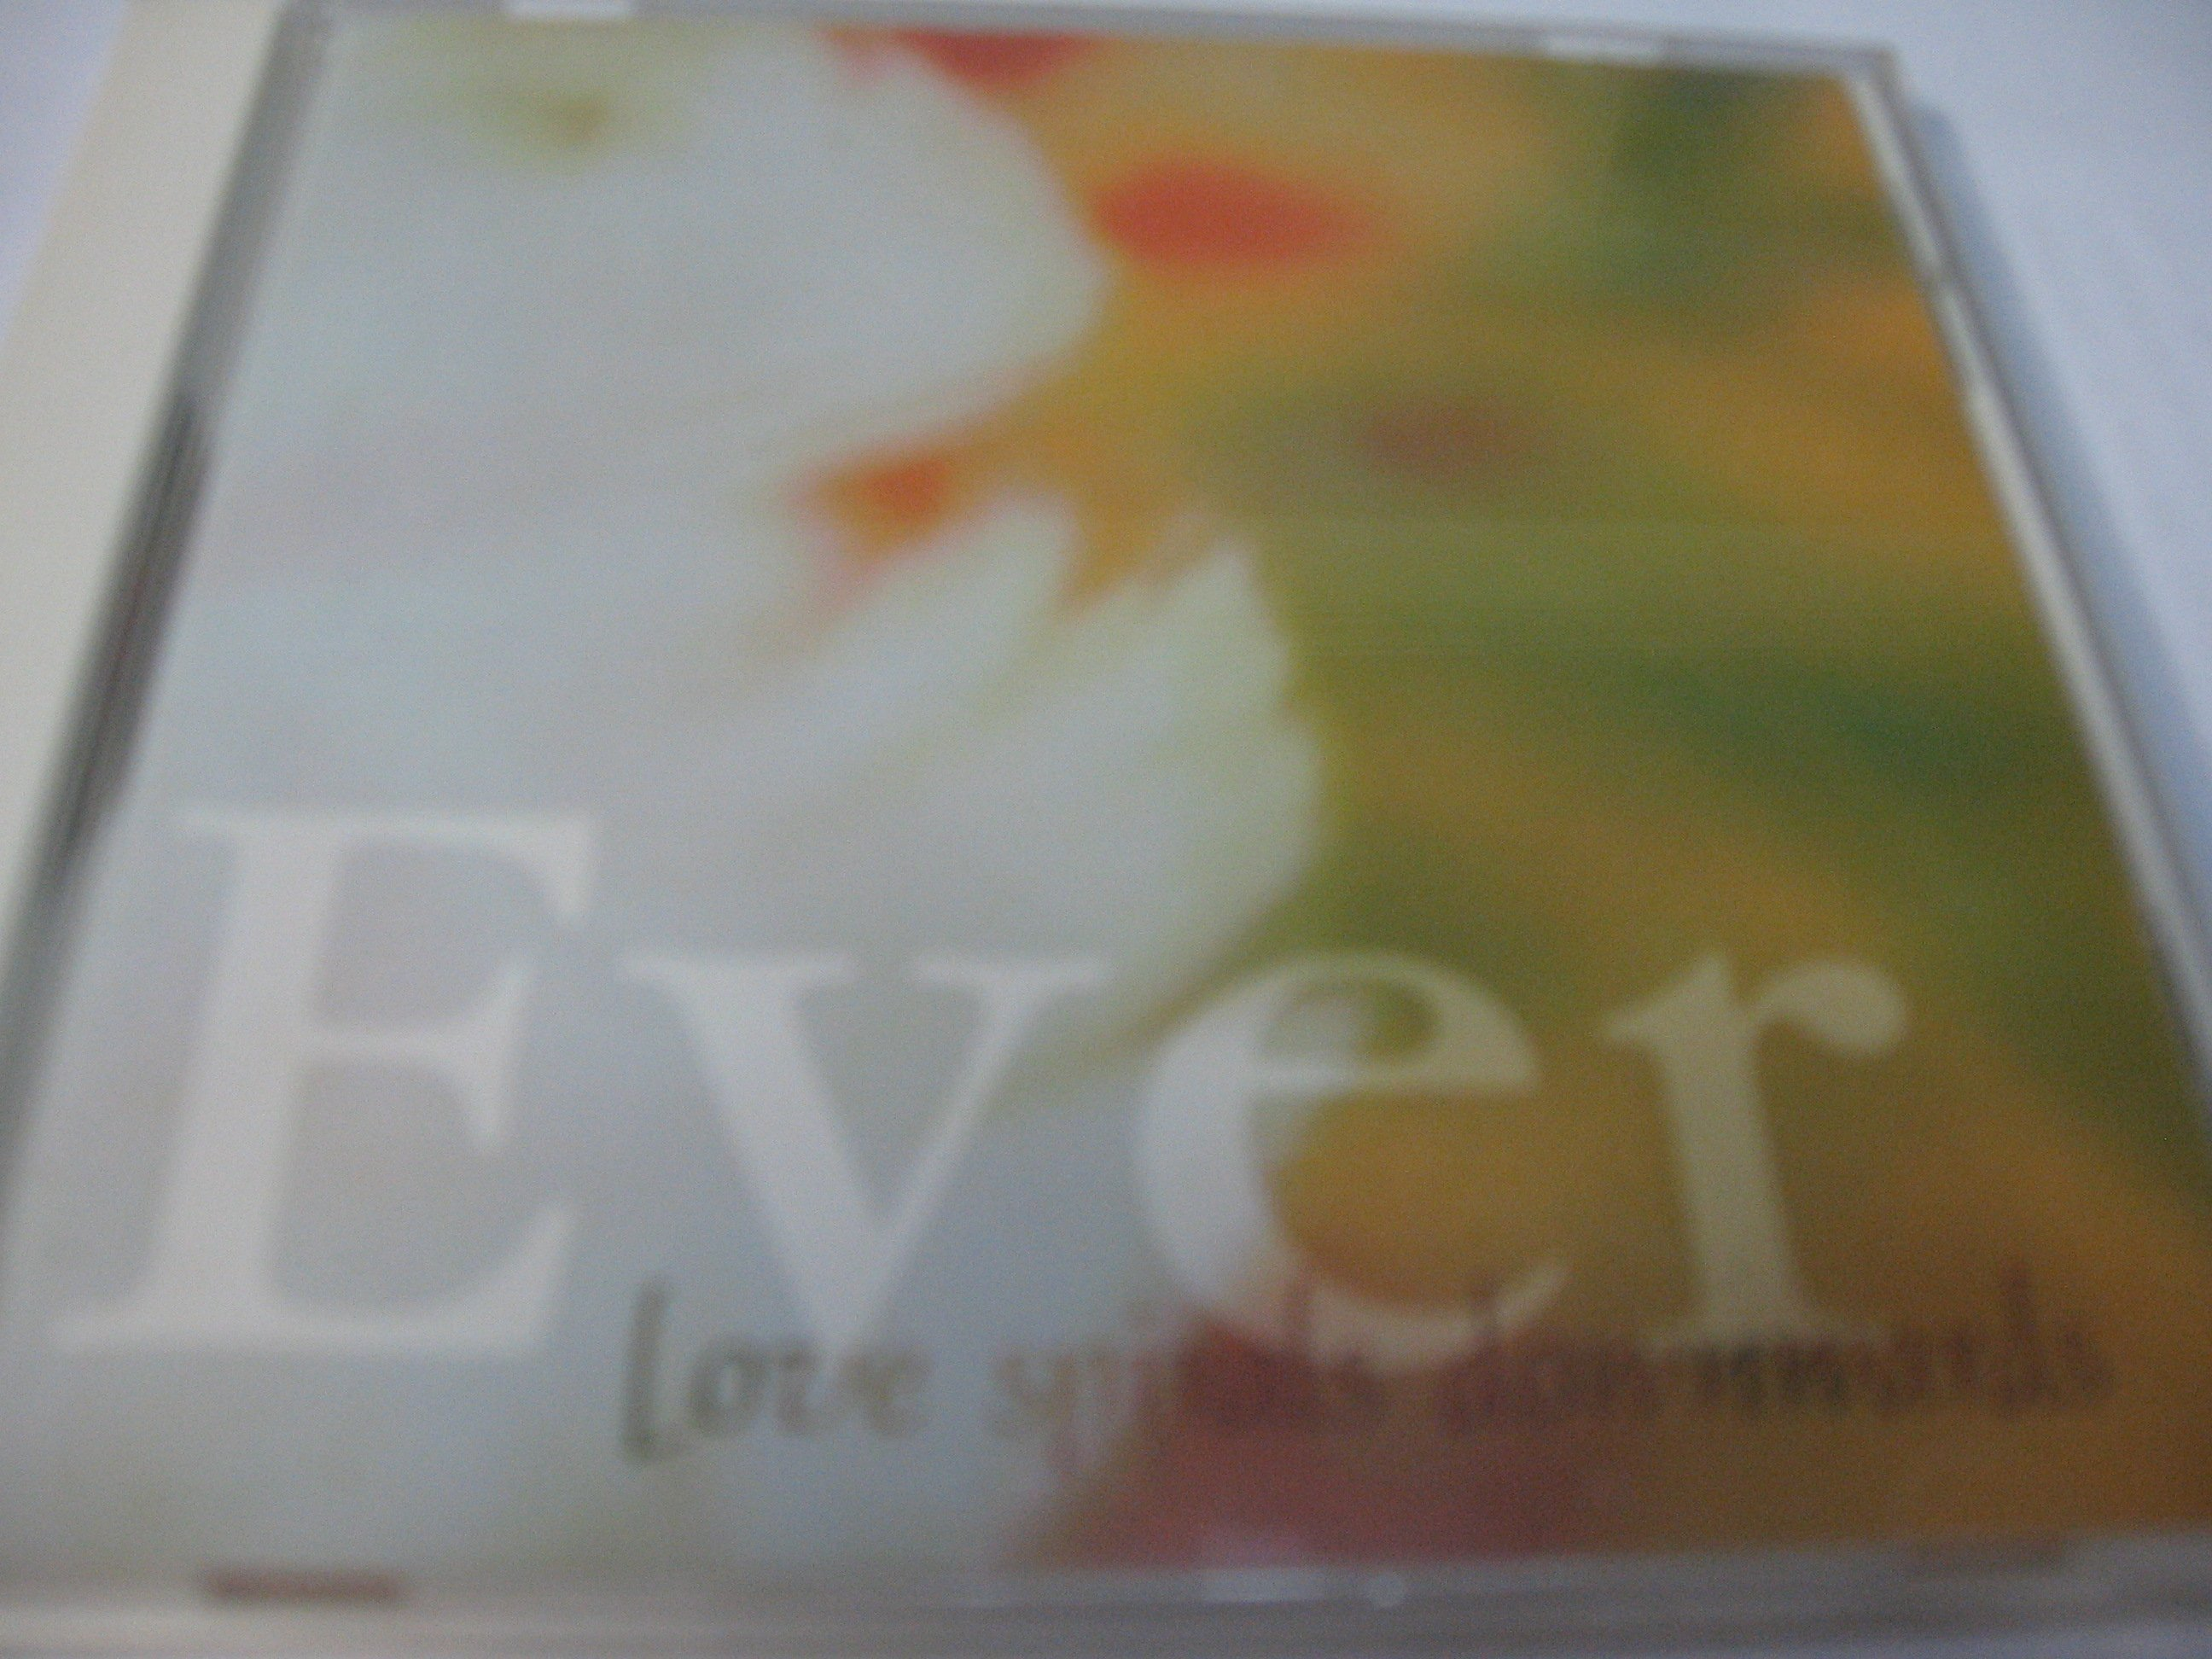 Love Spirals Downwards沉溺之愛合唱團:Ever曾經 1996年Projekt 自藏CD 美國製